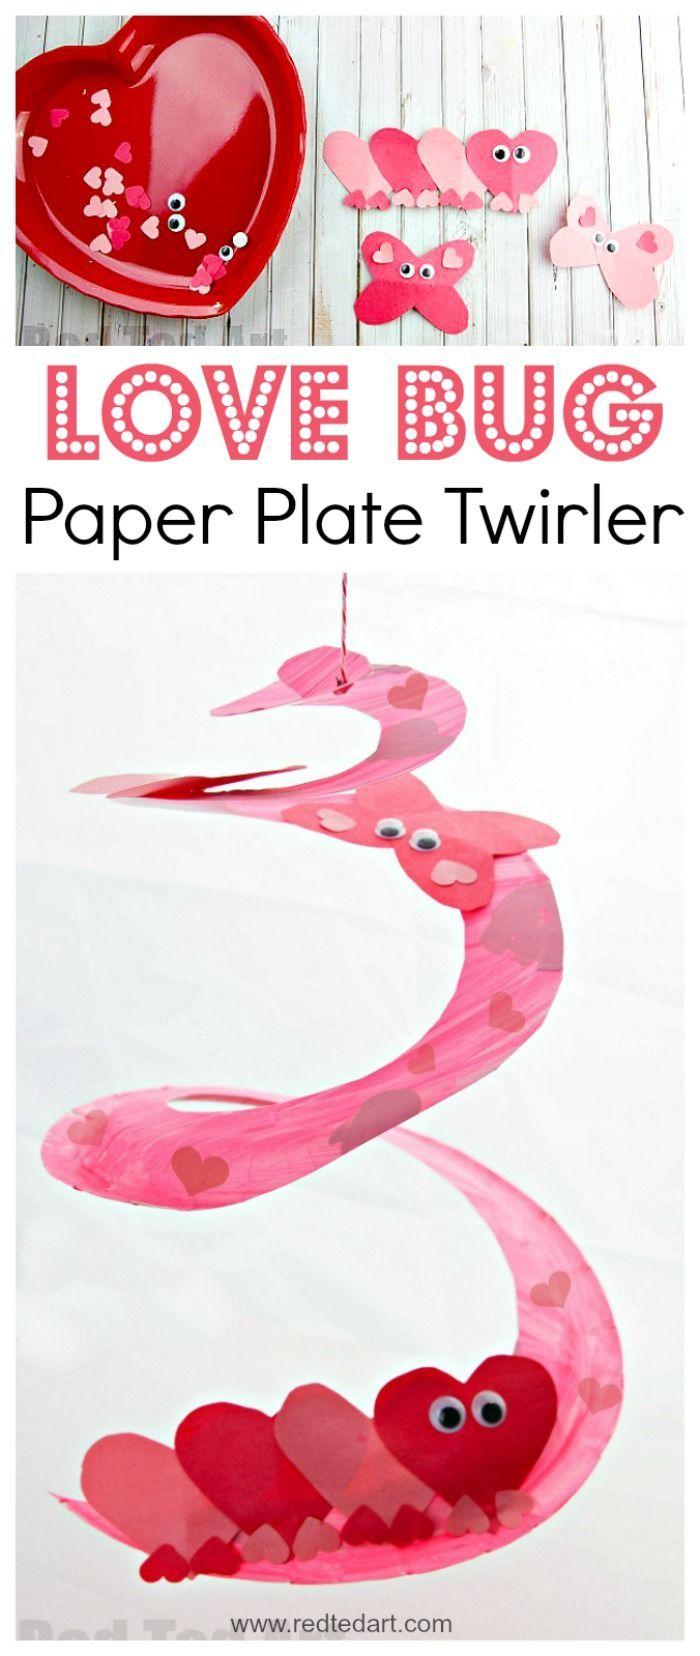 df86a9e63af142f23028e1491904ff7f - Love Bug Paper Plate Twirler. Oh my, this is such a super duper CUTE Valentine's...